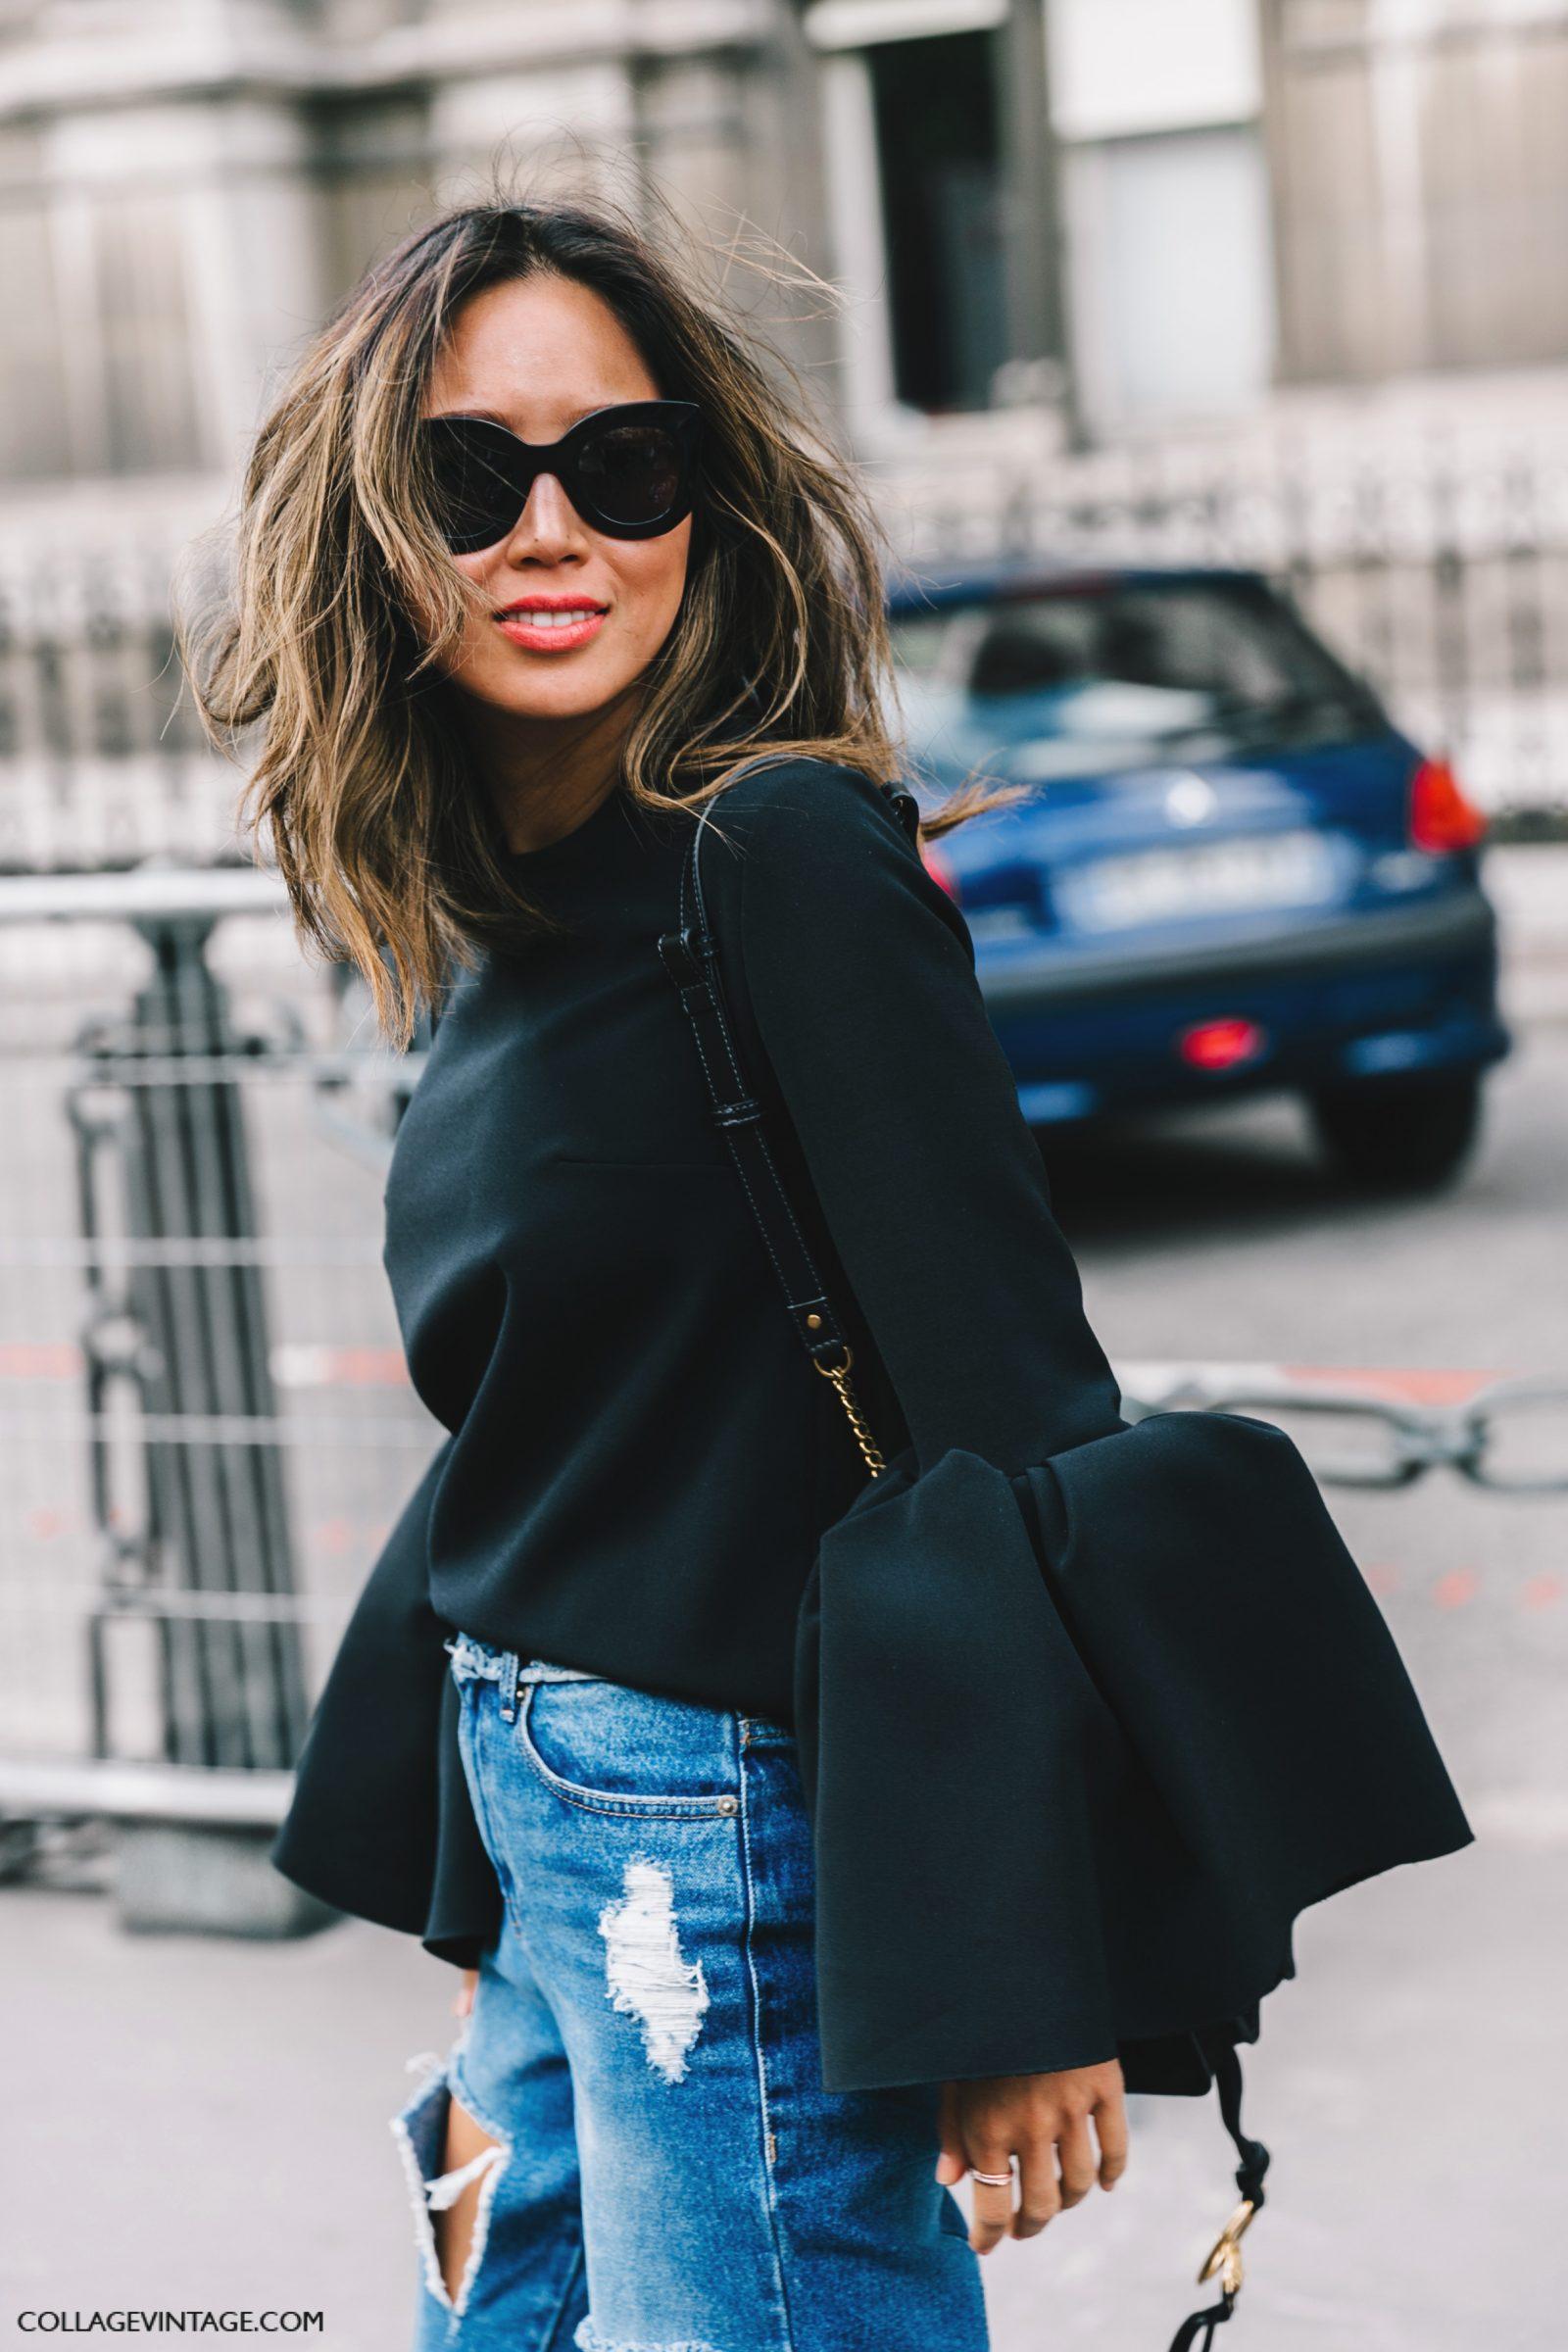 pfw-paris_fashion_week_ss17-street_style-outfits-collage_vintage-rochas-courreges-dries_van_noten-lanvin-guy_laroche-99